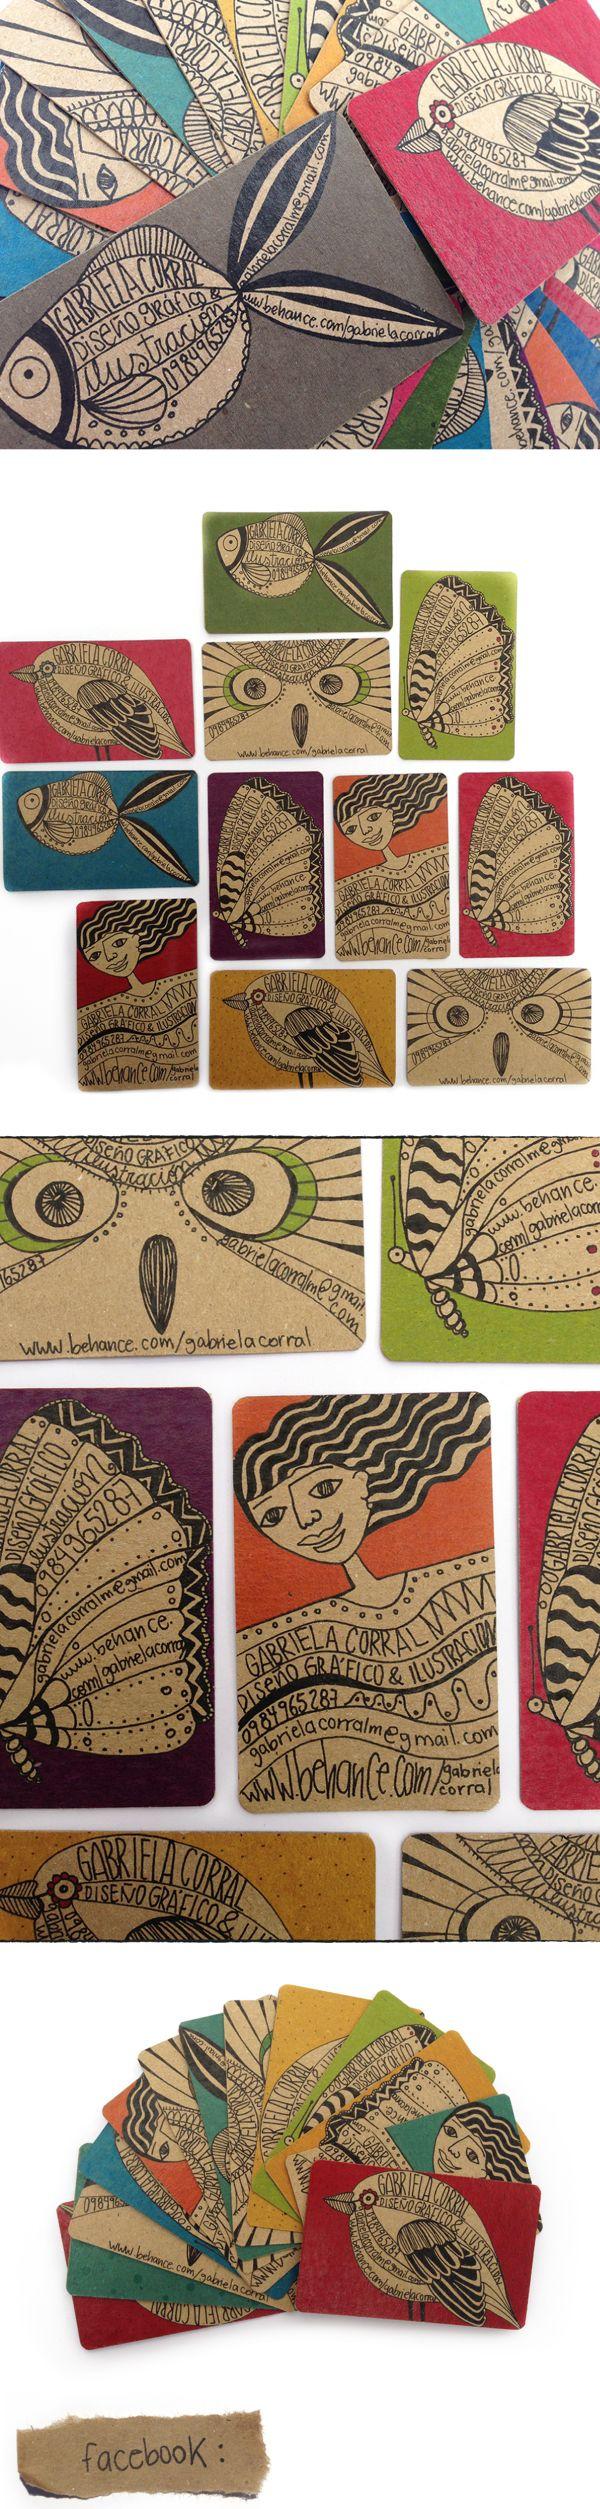 Tarjetas personales 1.2 by Gabriela Corral, via Behance